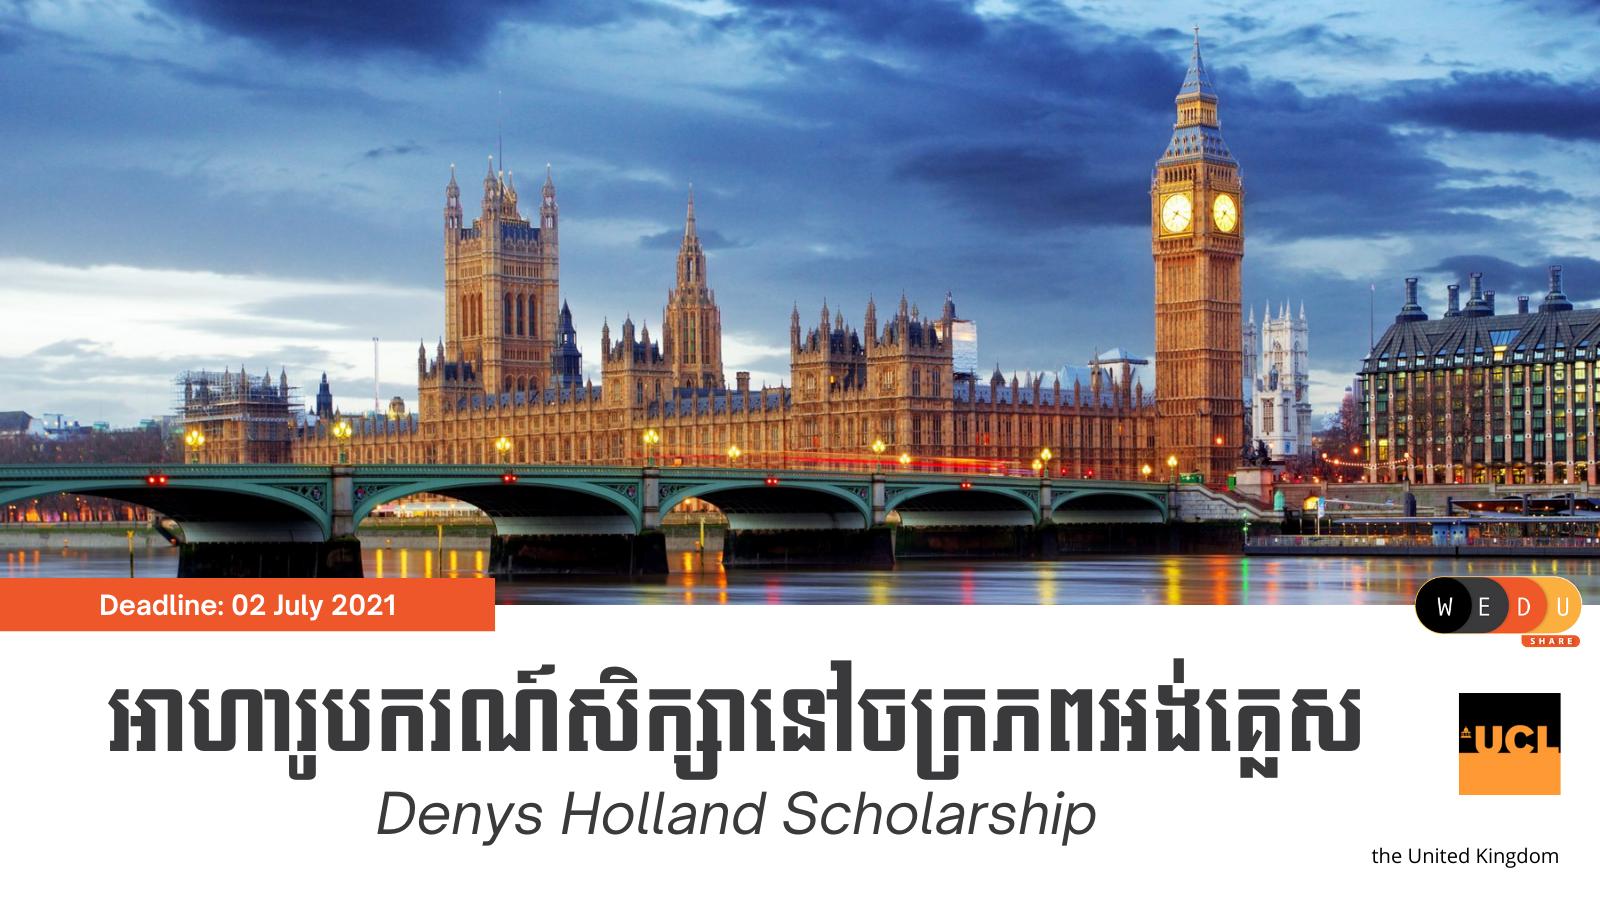 Denys Holland Scholarship